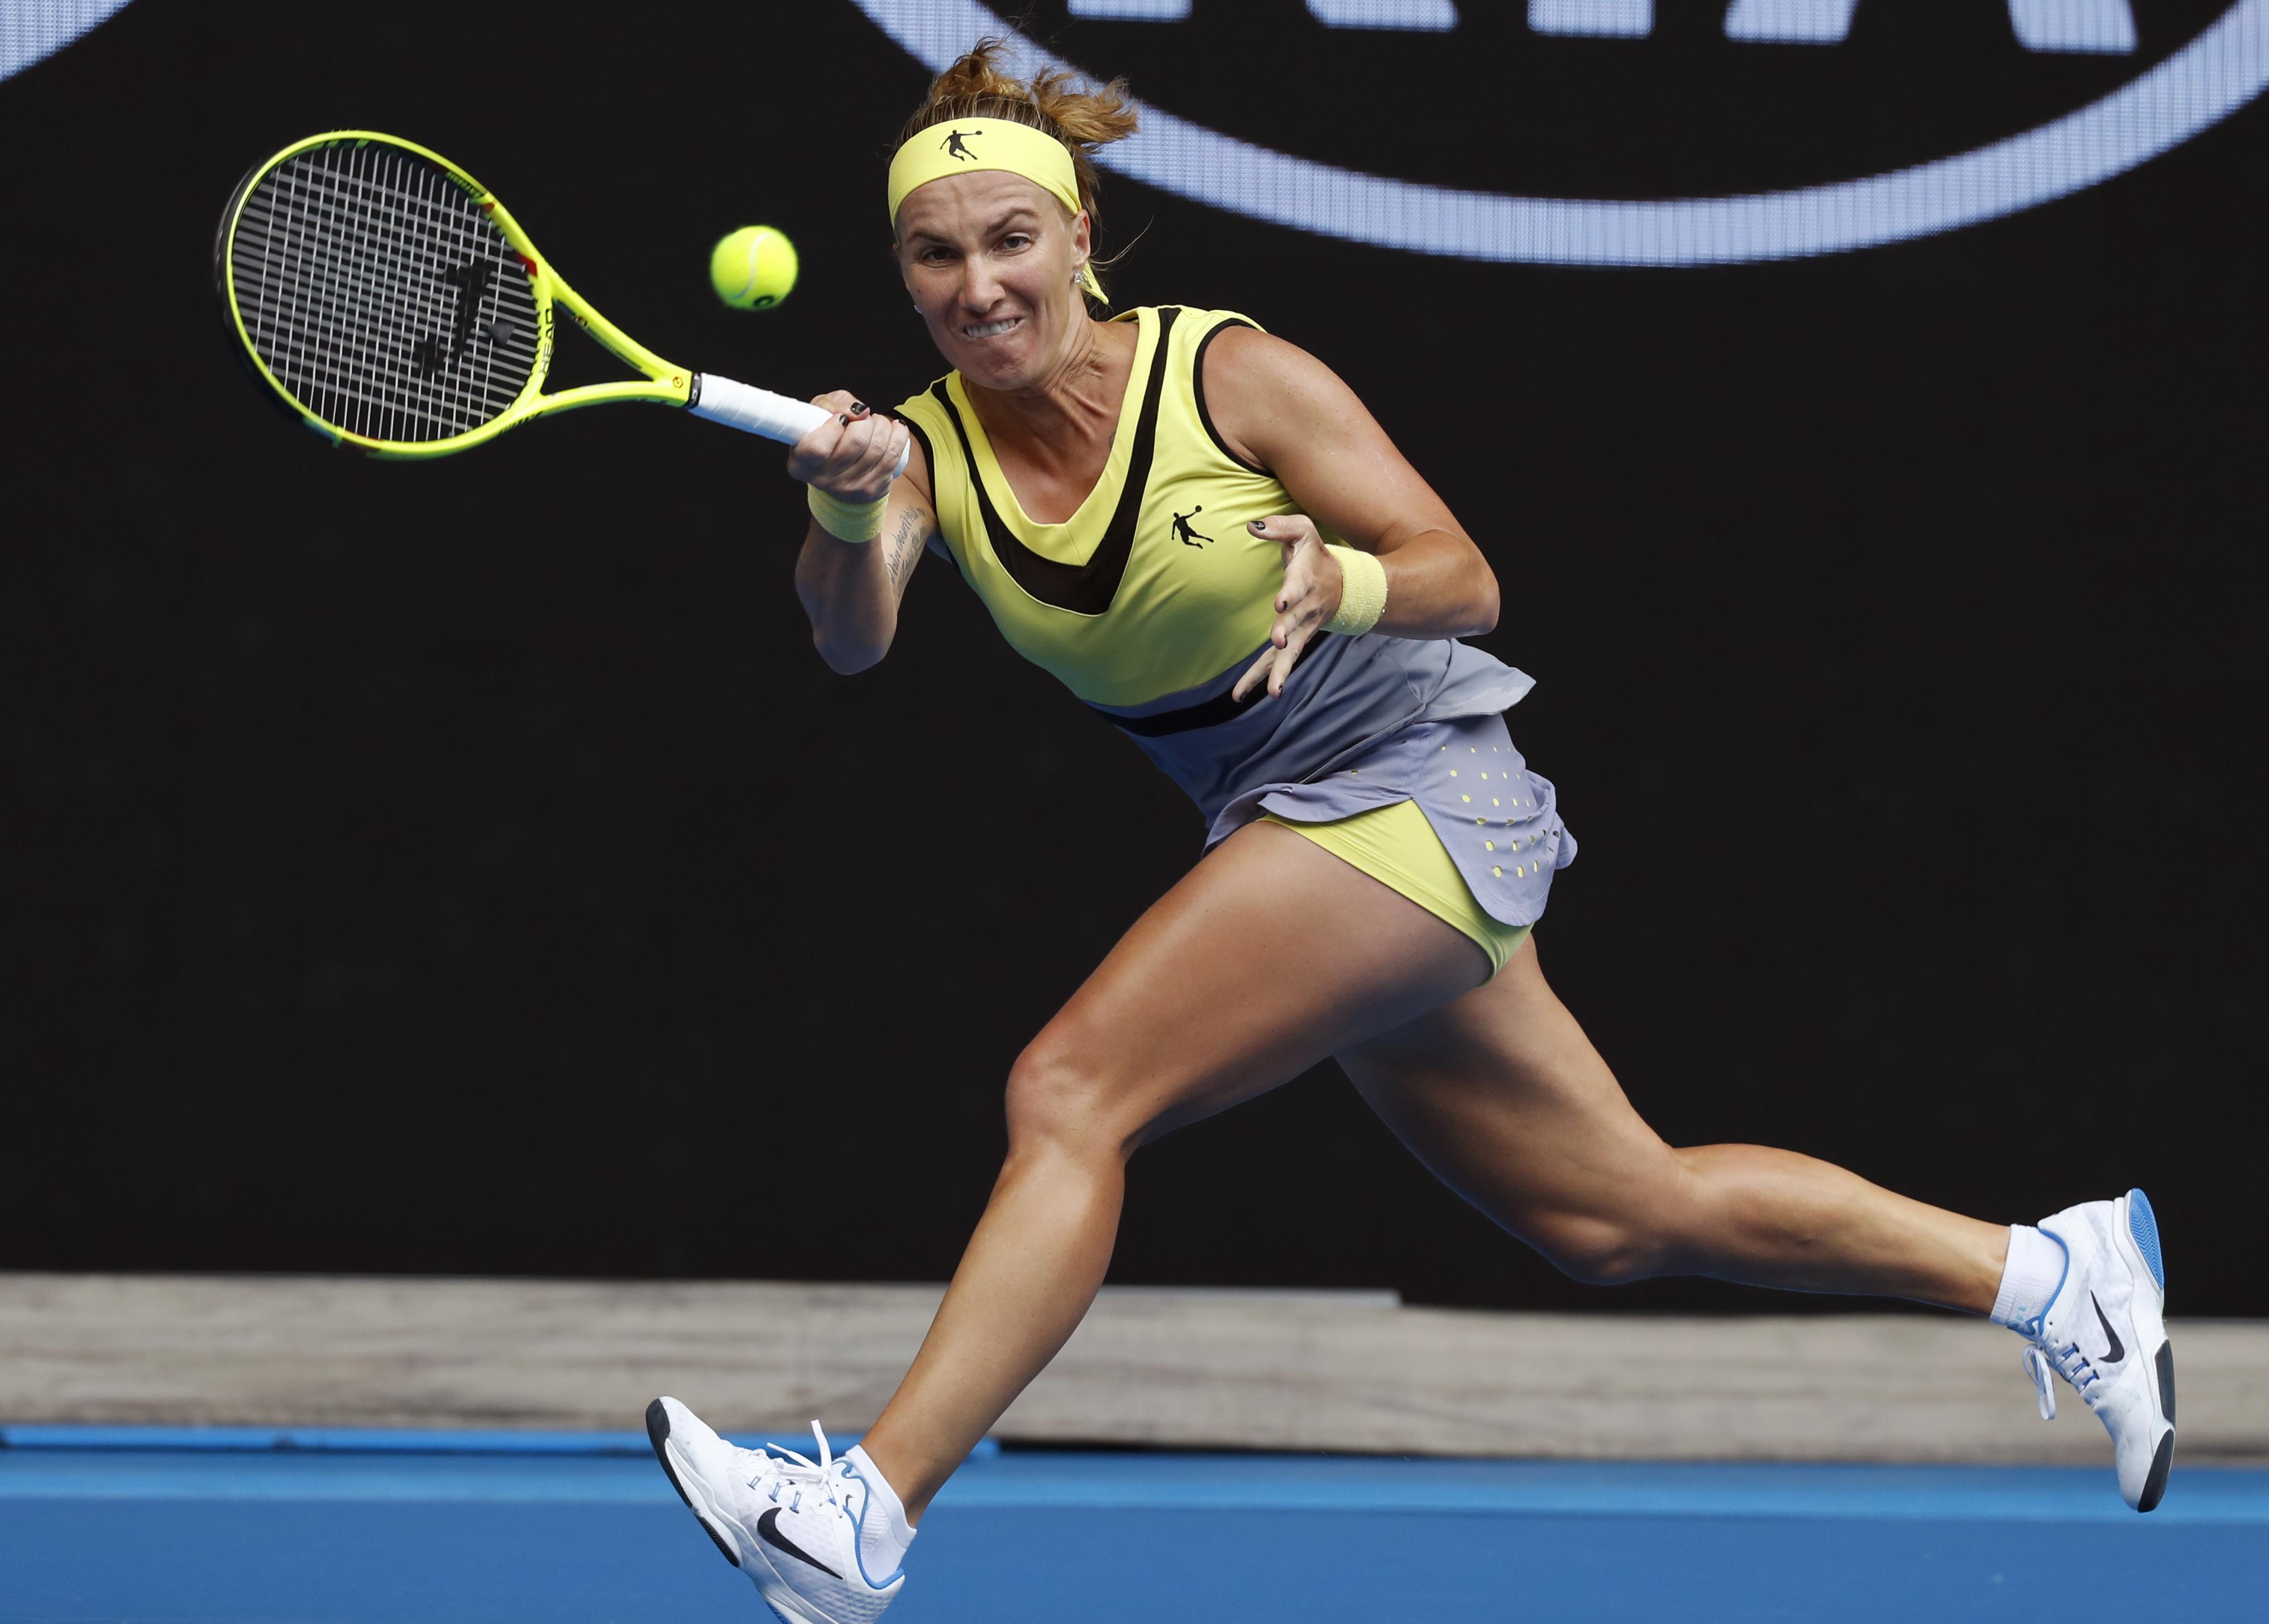 Russia's Svetlana Kuznetsova makes a forehand return to Serbia's Jelena Jankovic during their third round match at the Australian Open tennis championships in Melbourne, Australia, Friday, Jan. 20, 2017. (AP Photo/Kin Cheung)